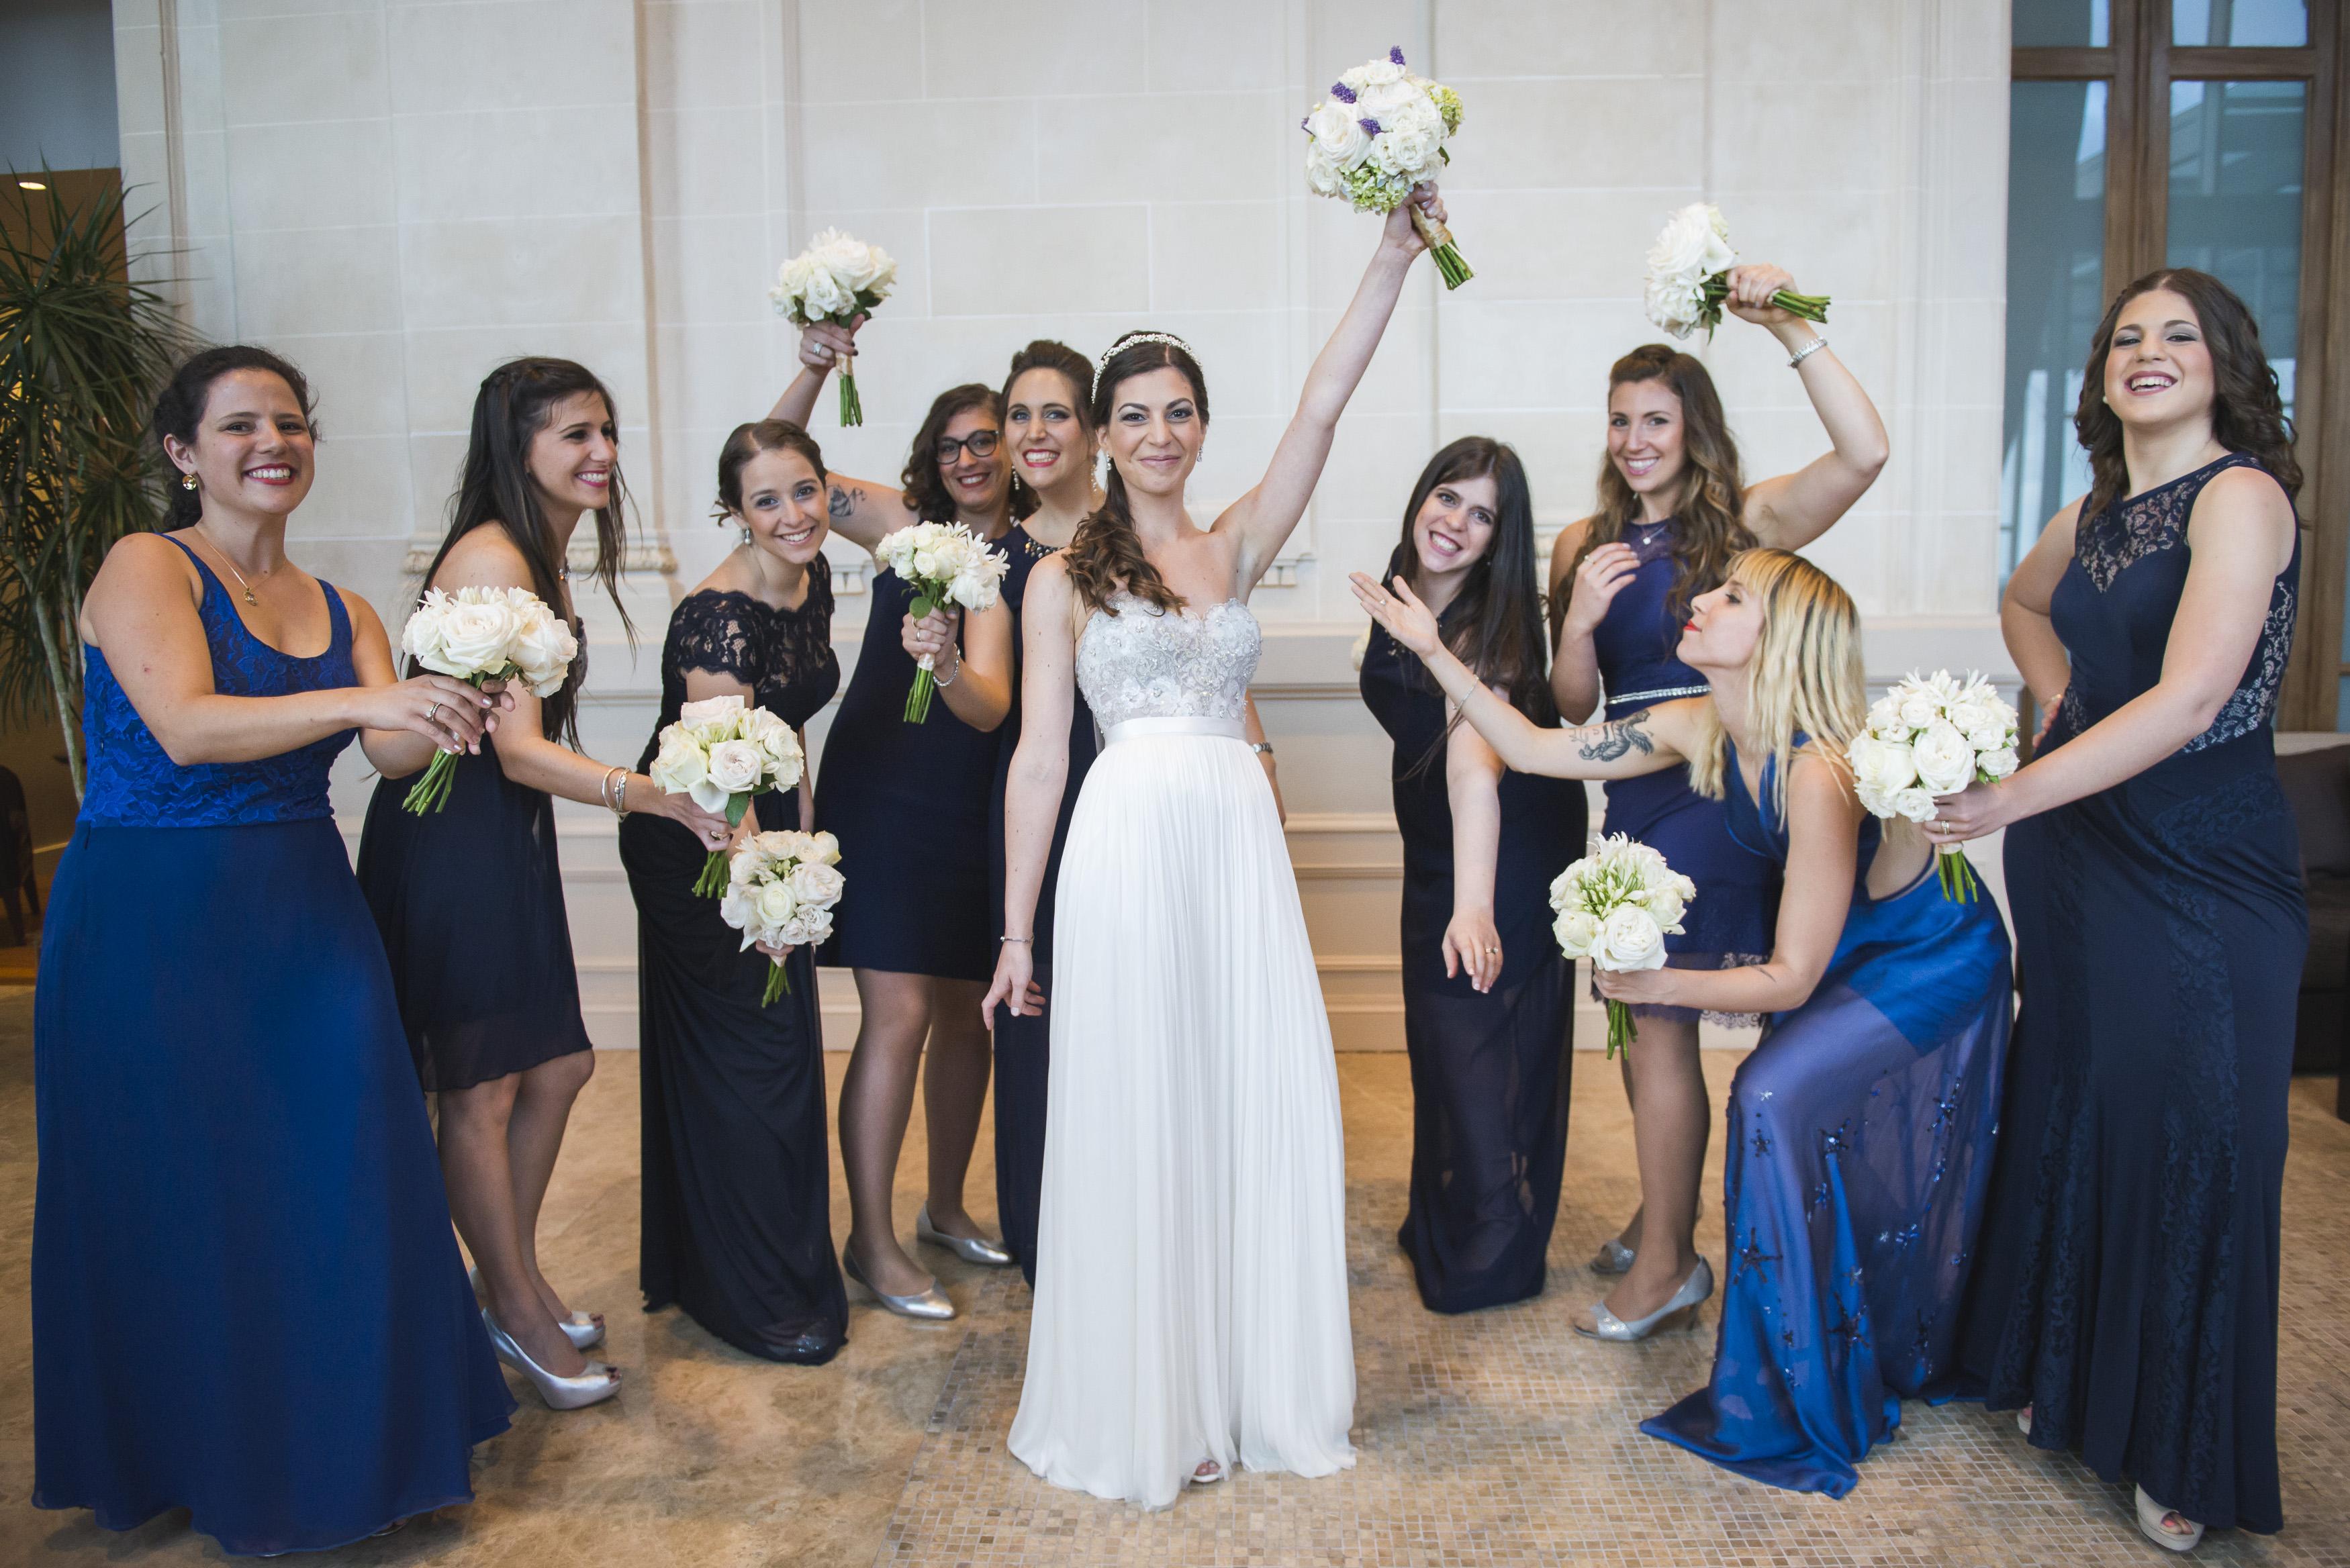 patricia-riba-boda-judia-uruguay-ionit-bryan-18